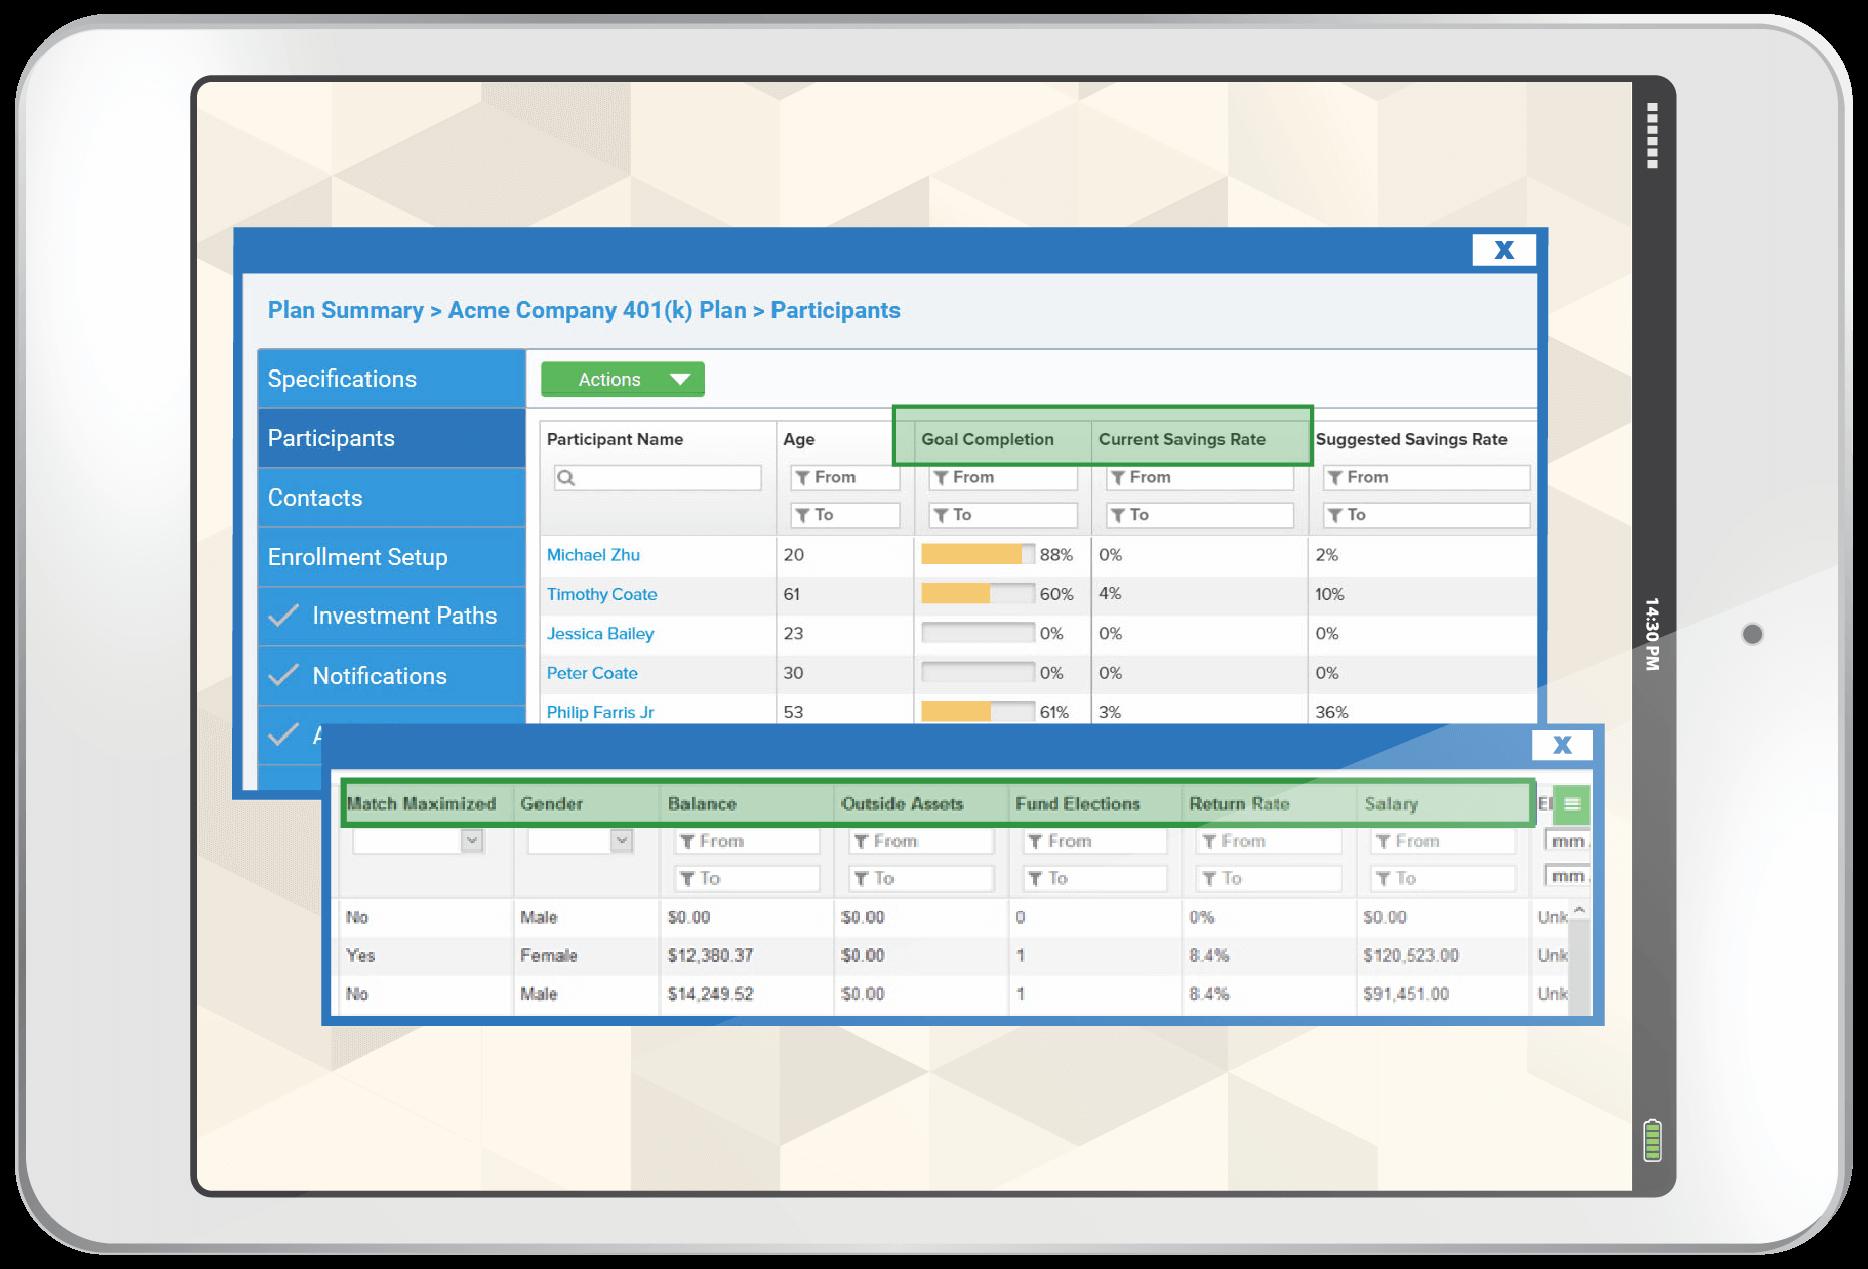 Tablet displaying screenshots of iJoin's Plan Summary tool